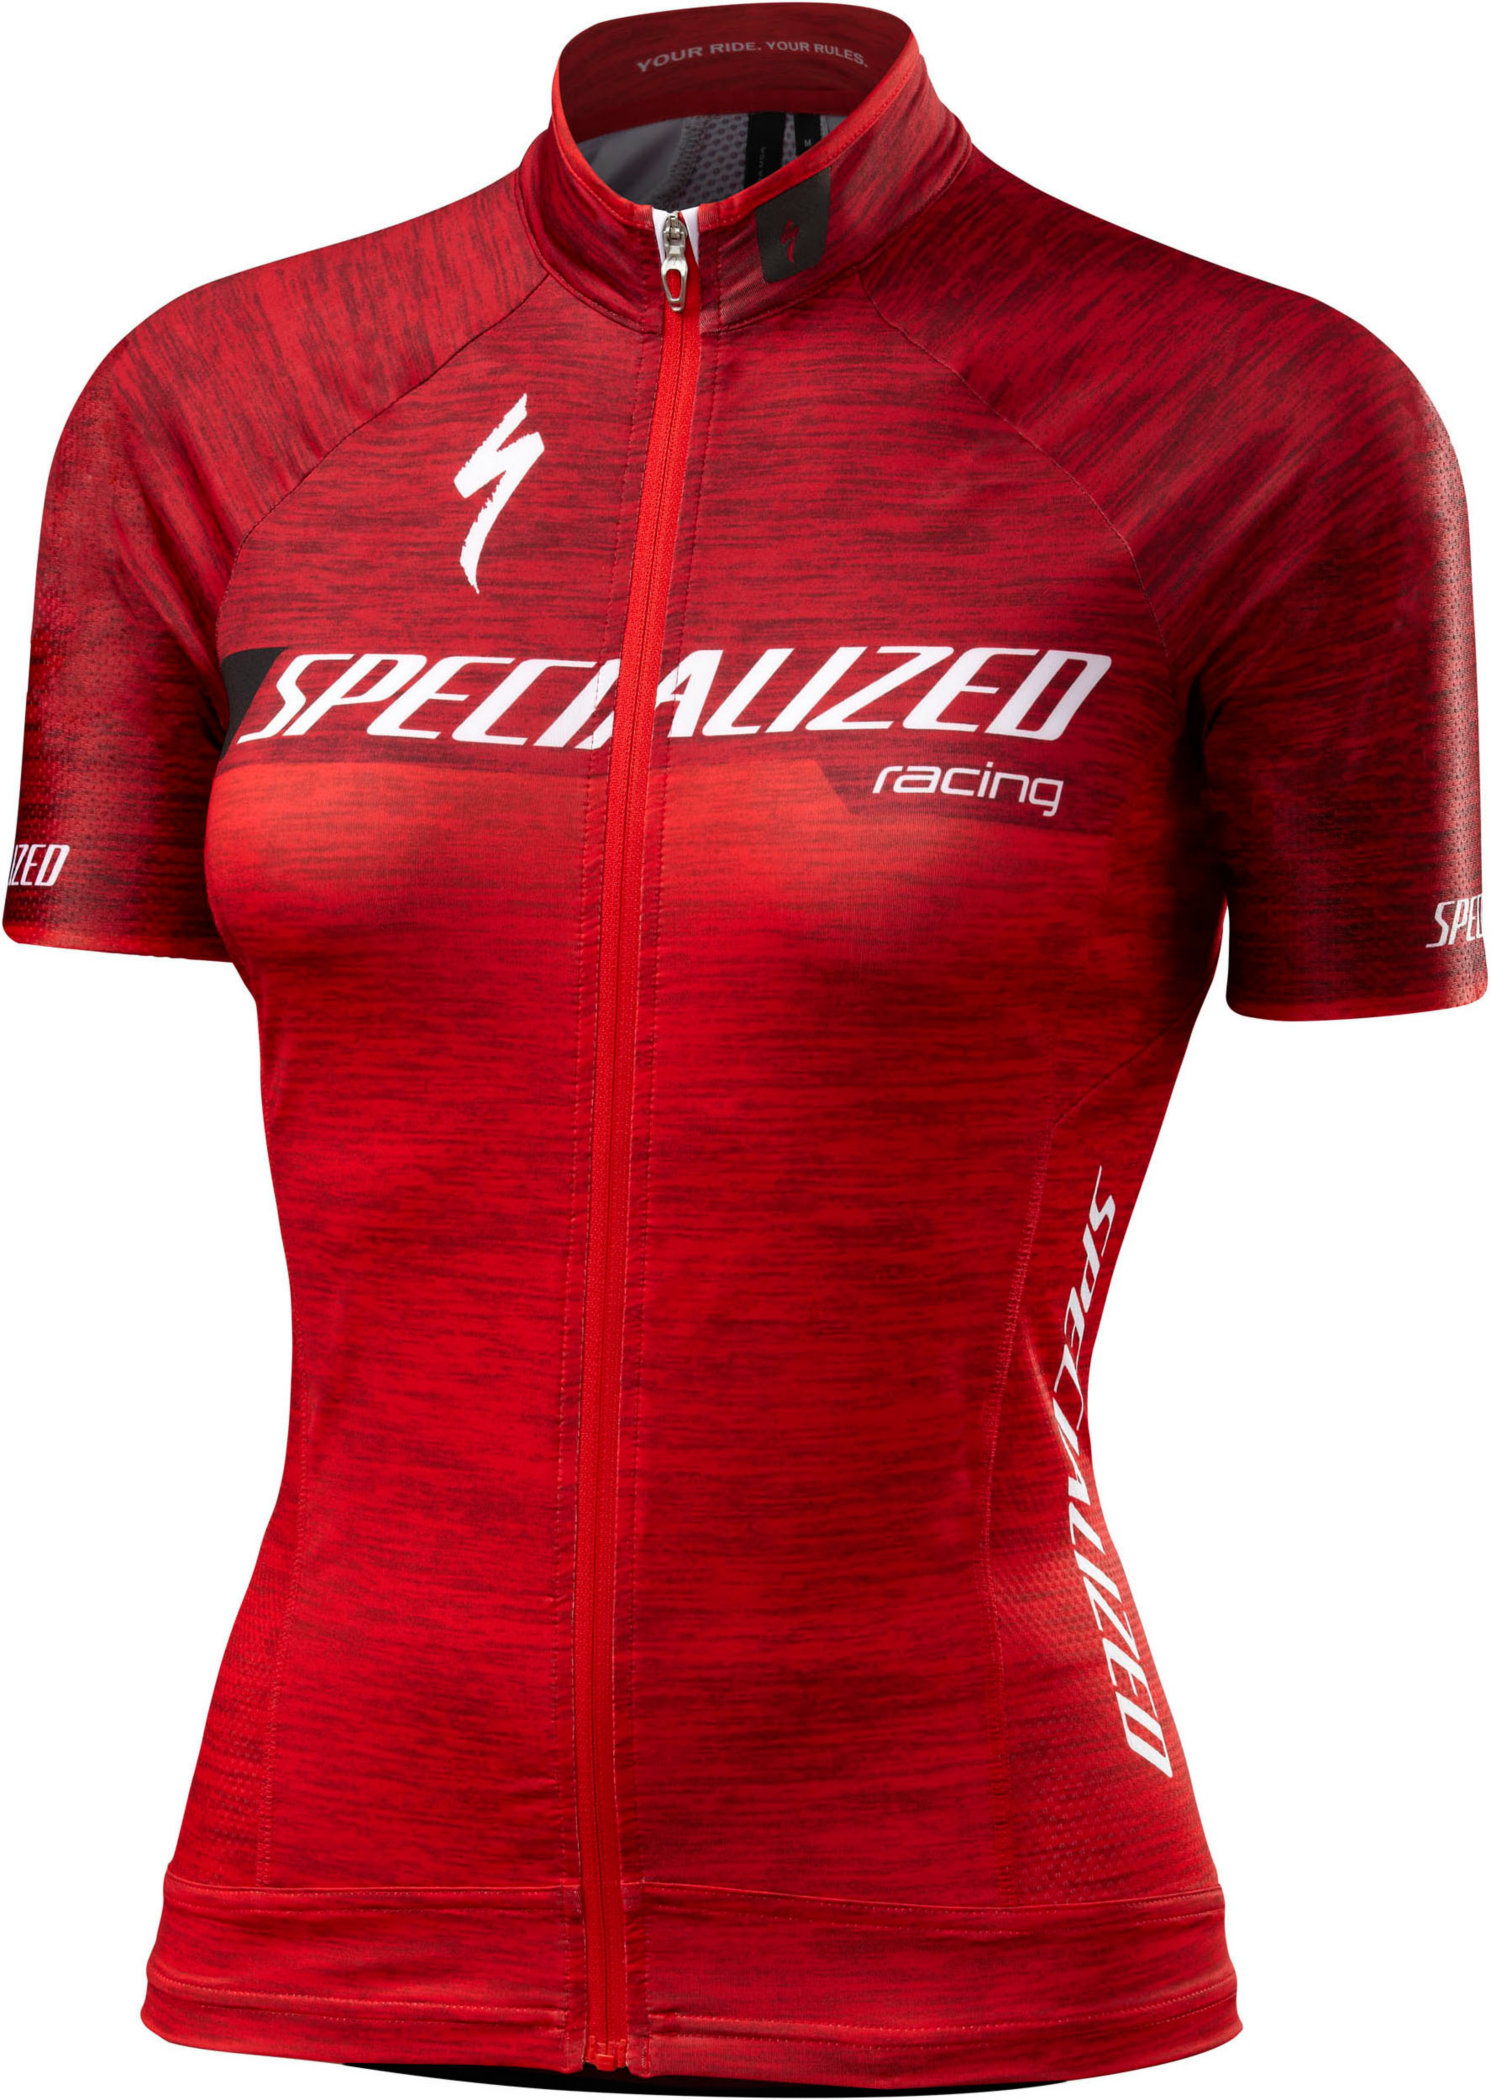 Specialized Women´s SL Pro Jersey Team Red Medium - Alpha Bikes